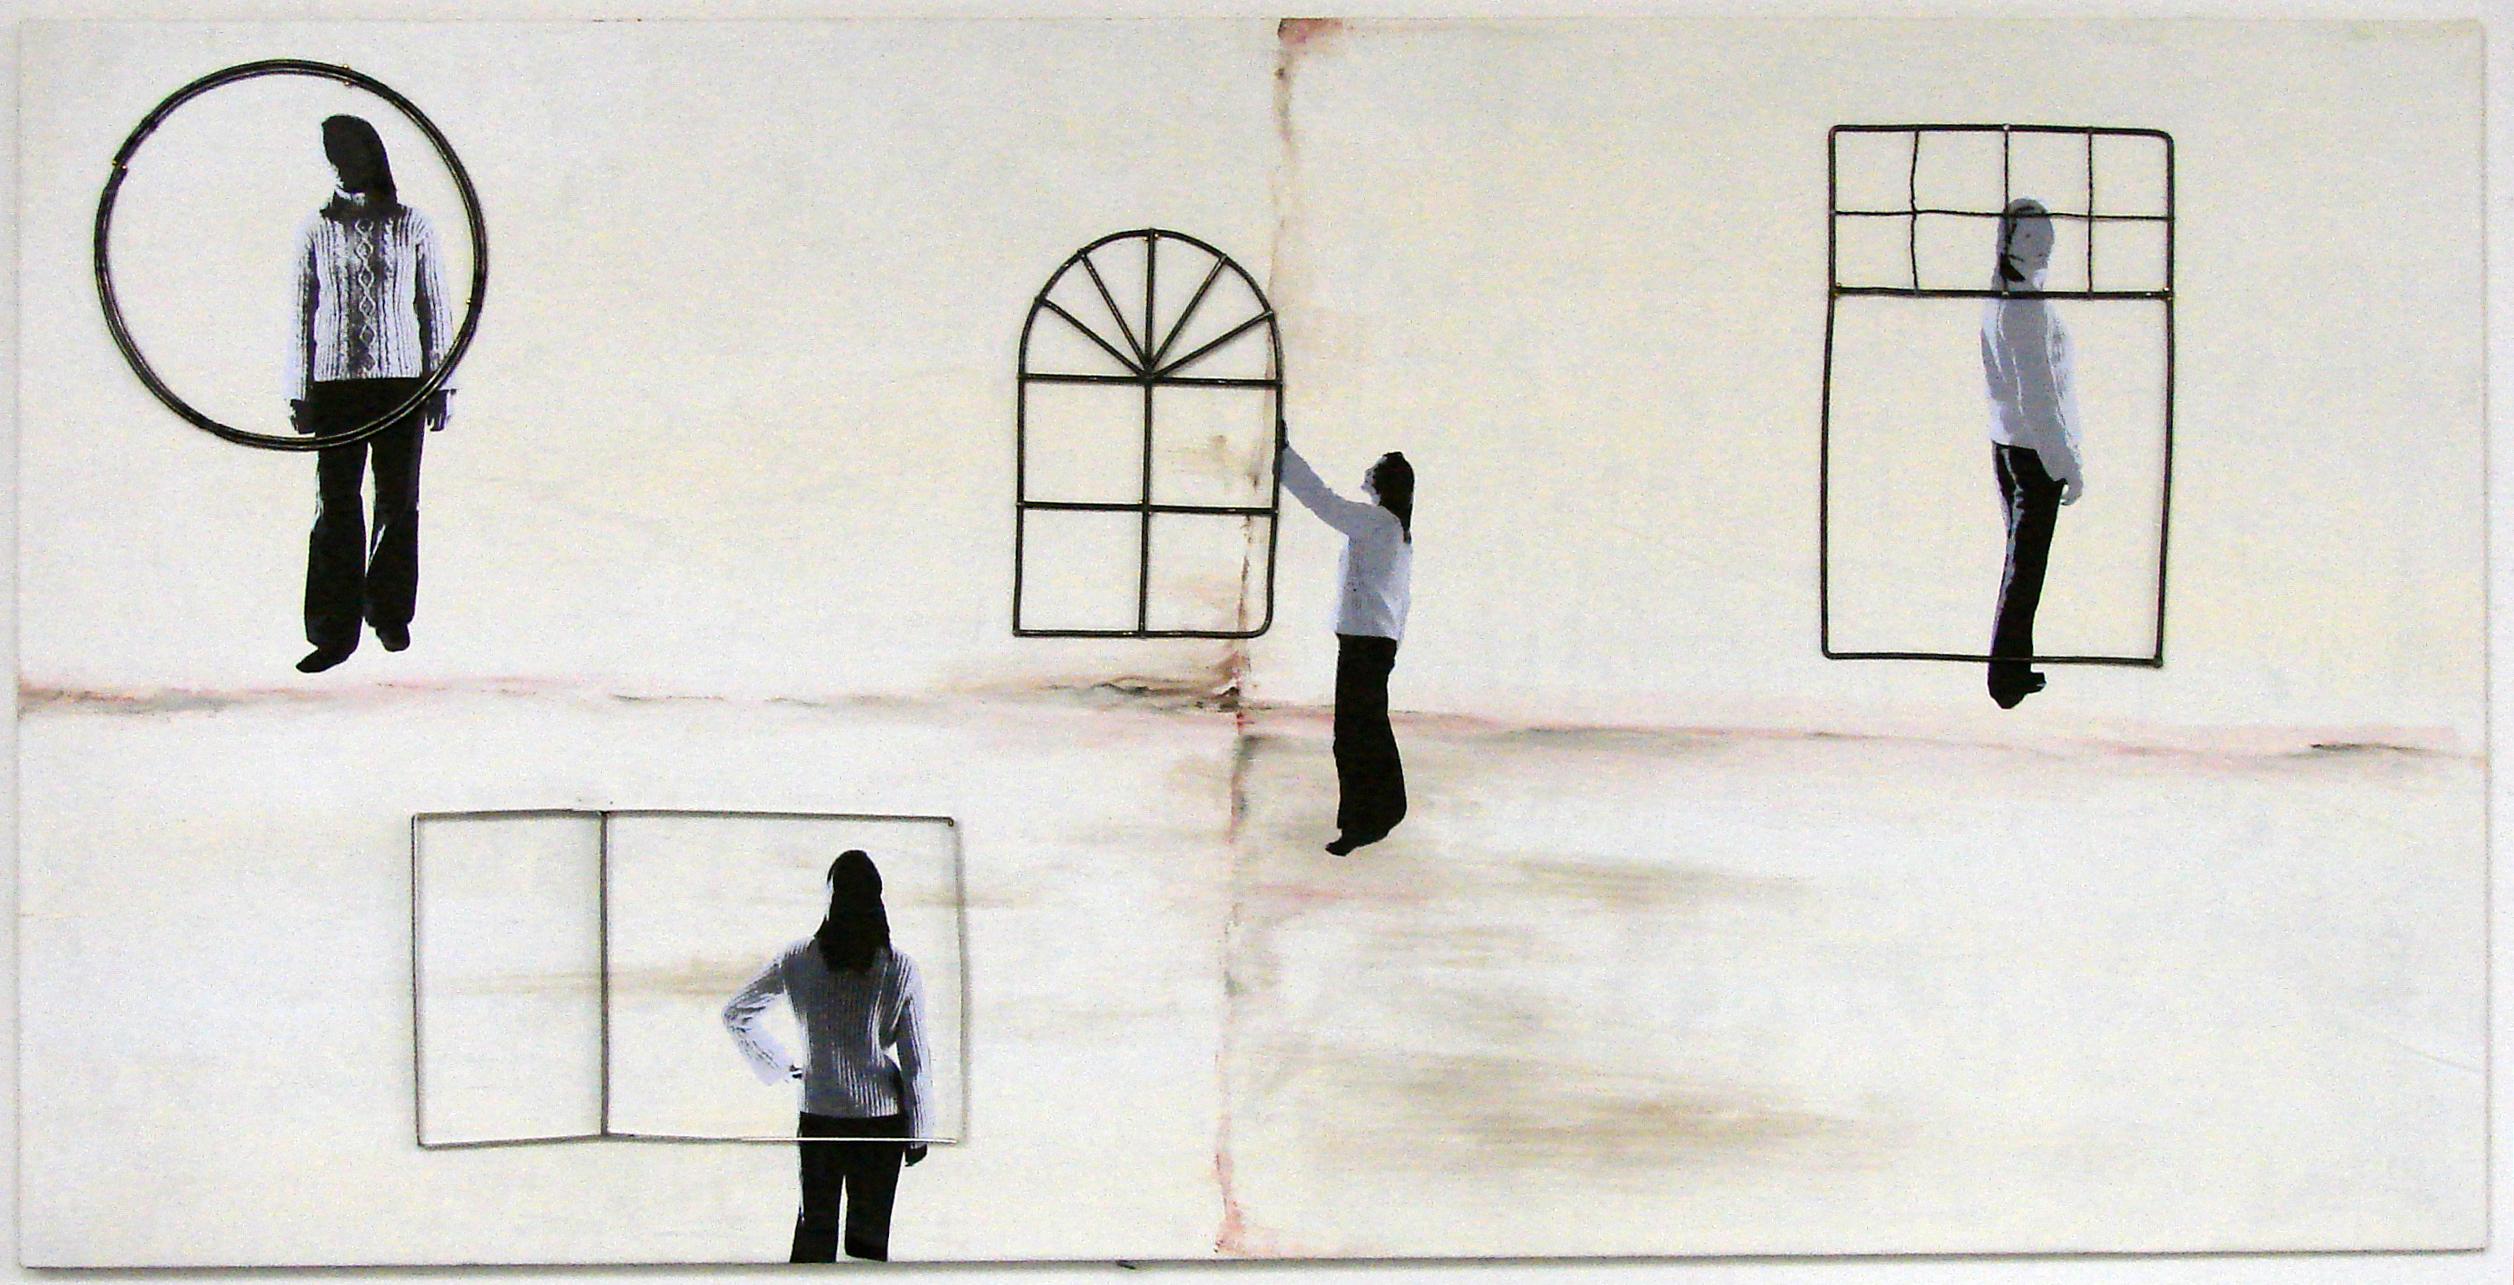 """Transition II"", 2007, steel, digital art, printer paper, acrylic paint"